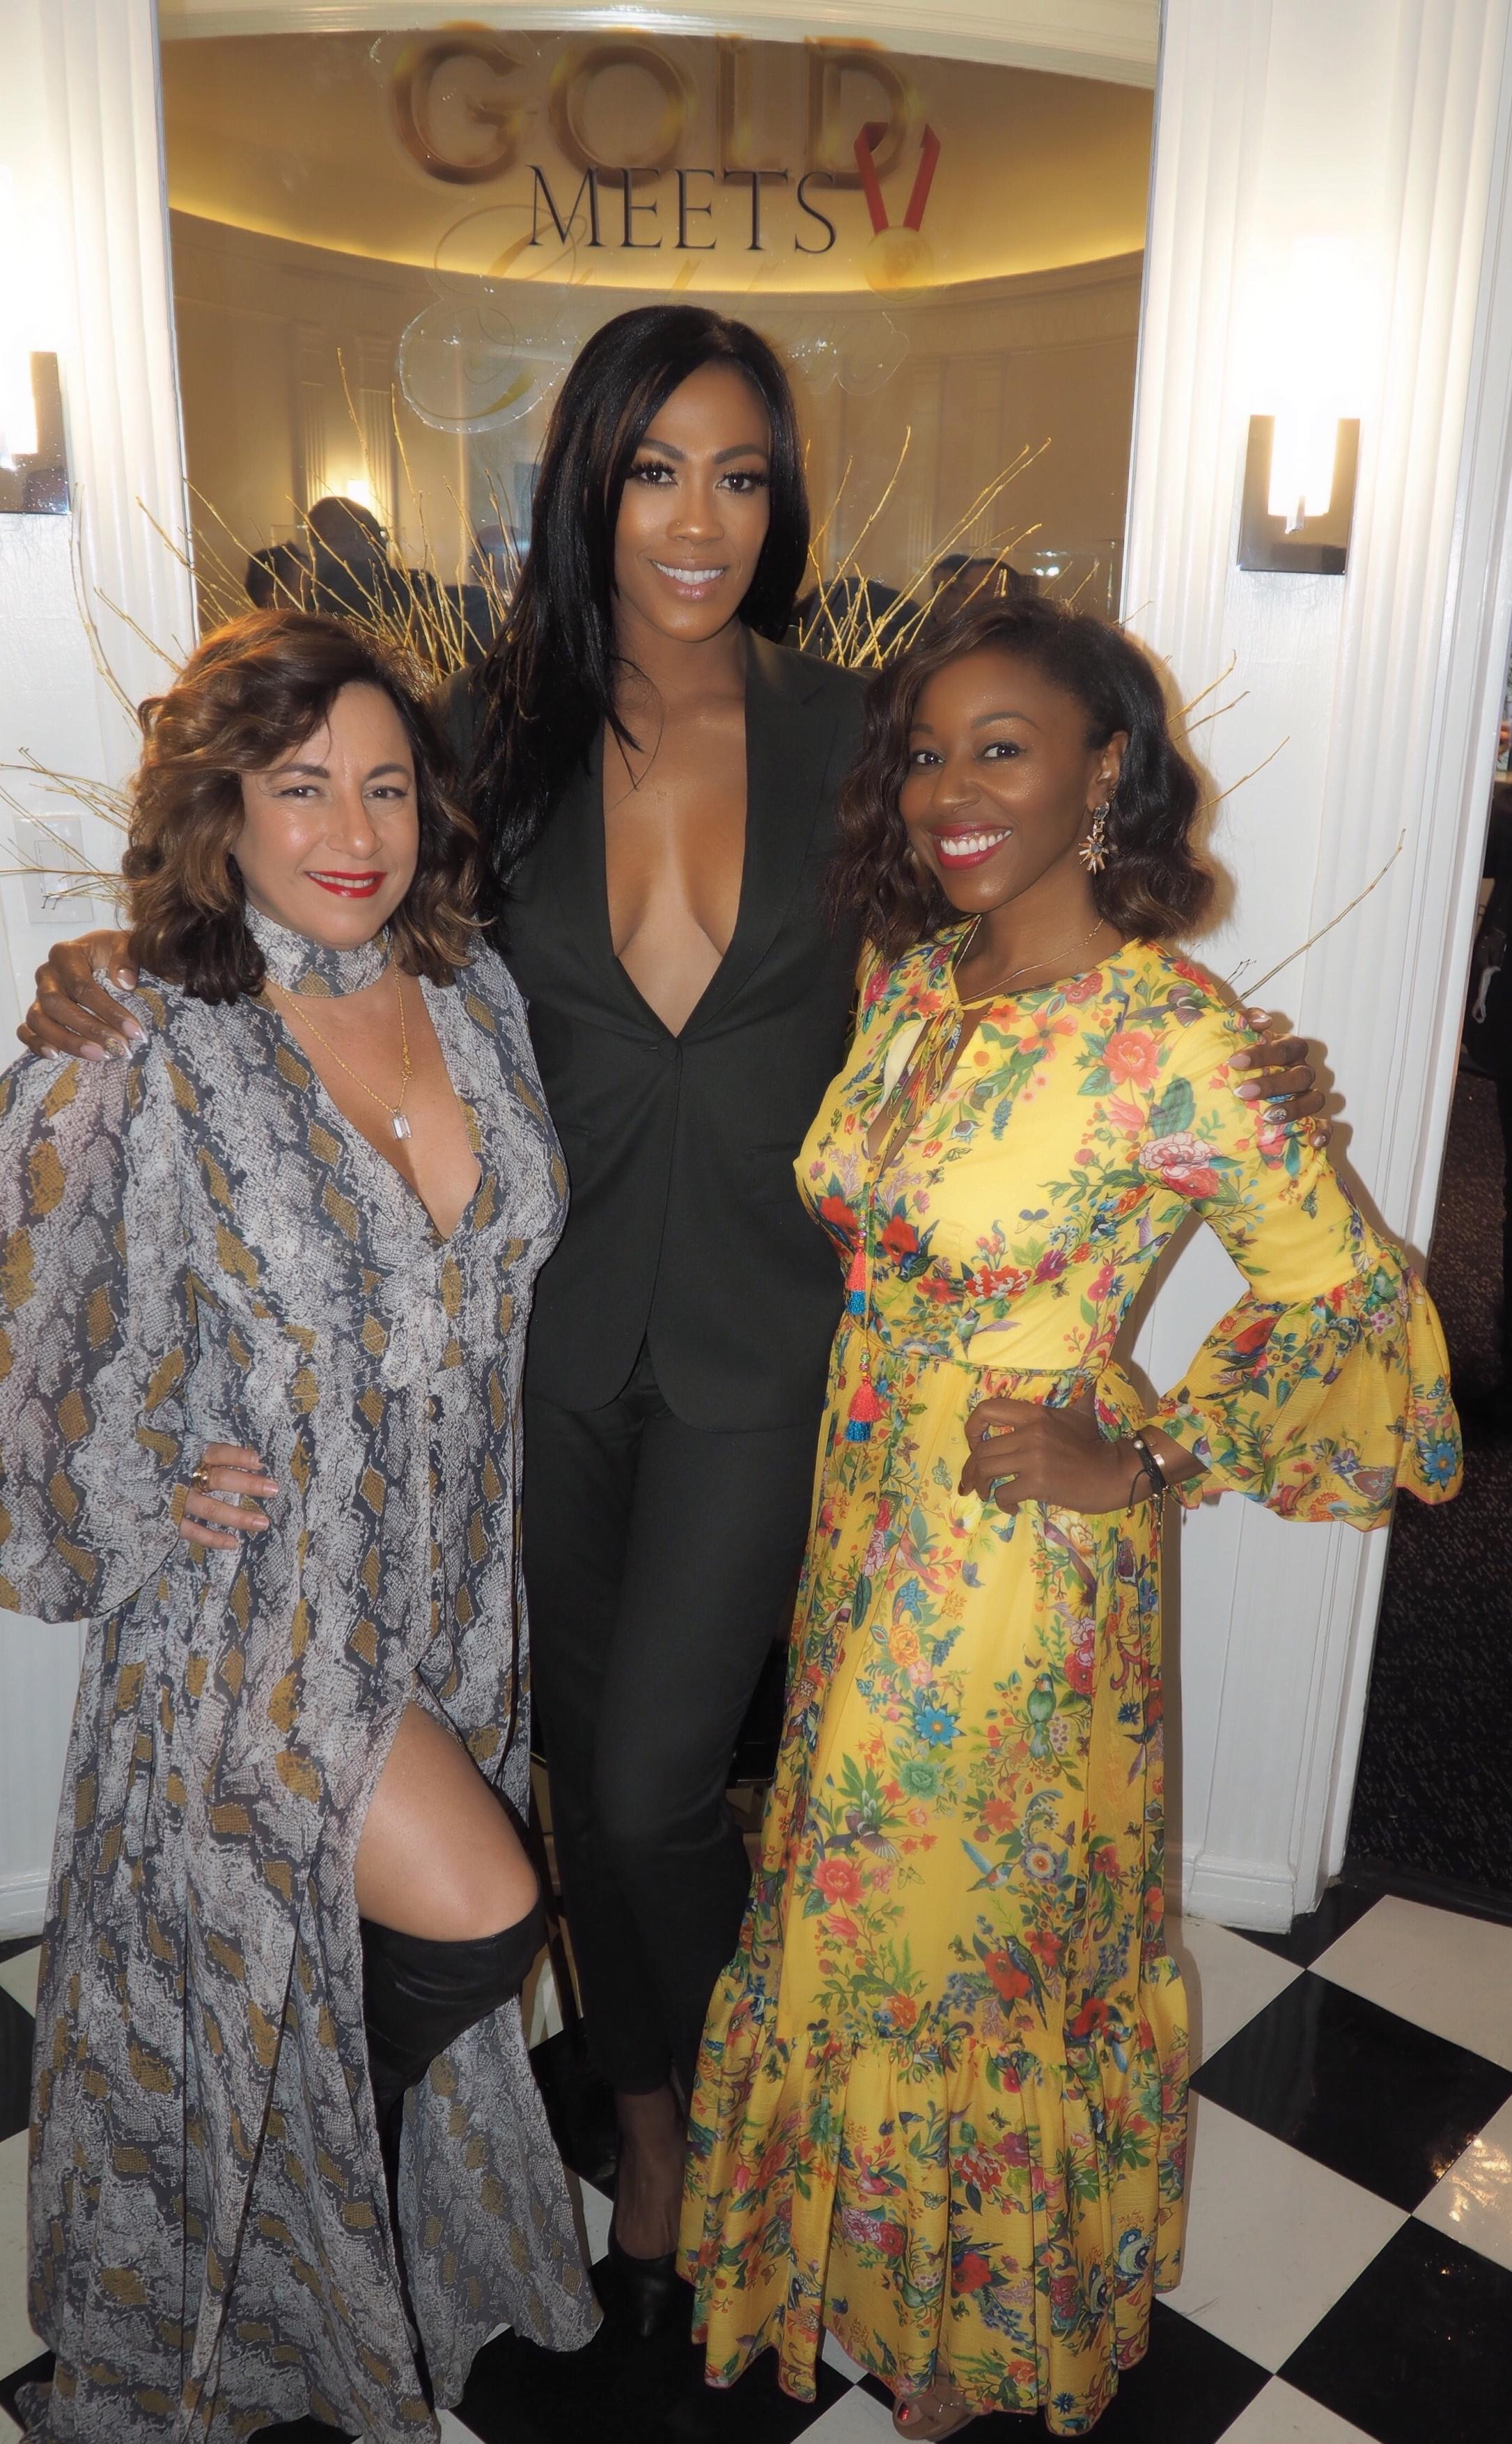 Selma Fonseca with Kim Glass and Kinya Claiborne